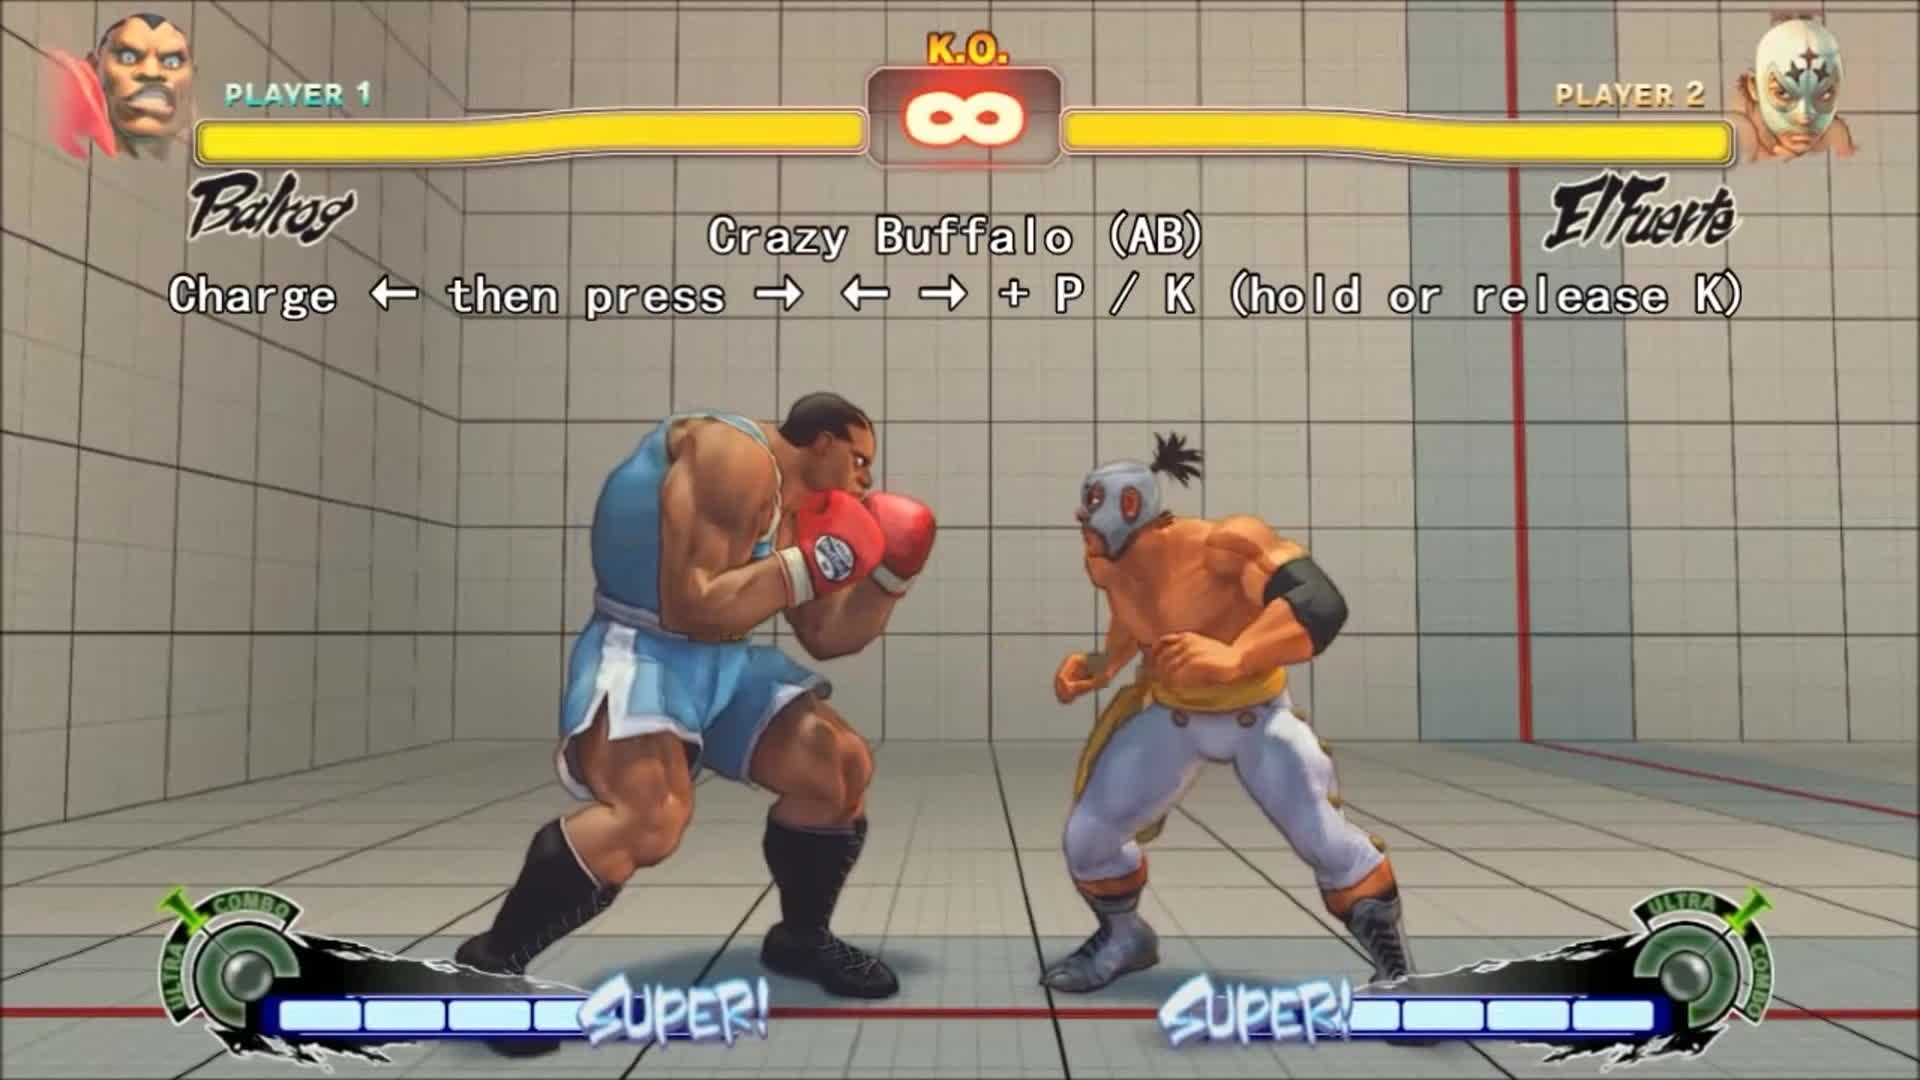 823020dd1 Ultra Street Fighter IV - Balrog Move List GIF   Find, Make & Share Gfycat  GIFs